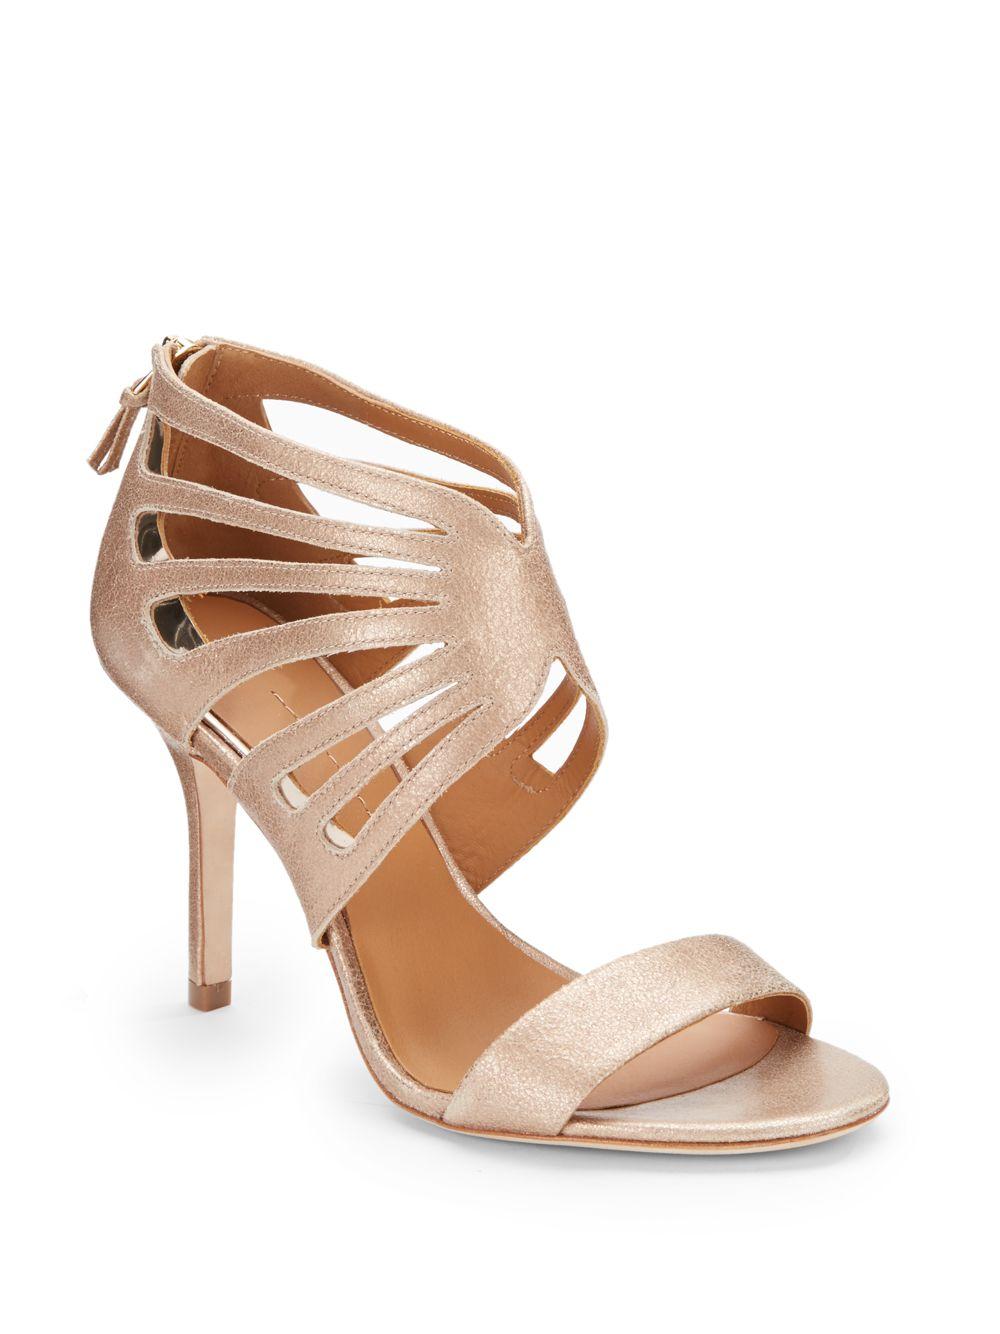 Aerin Chiara Metallic Leather Sandals In Gold Gold Blush